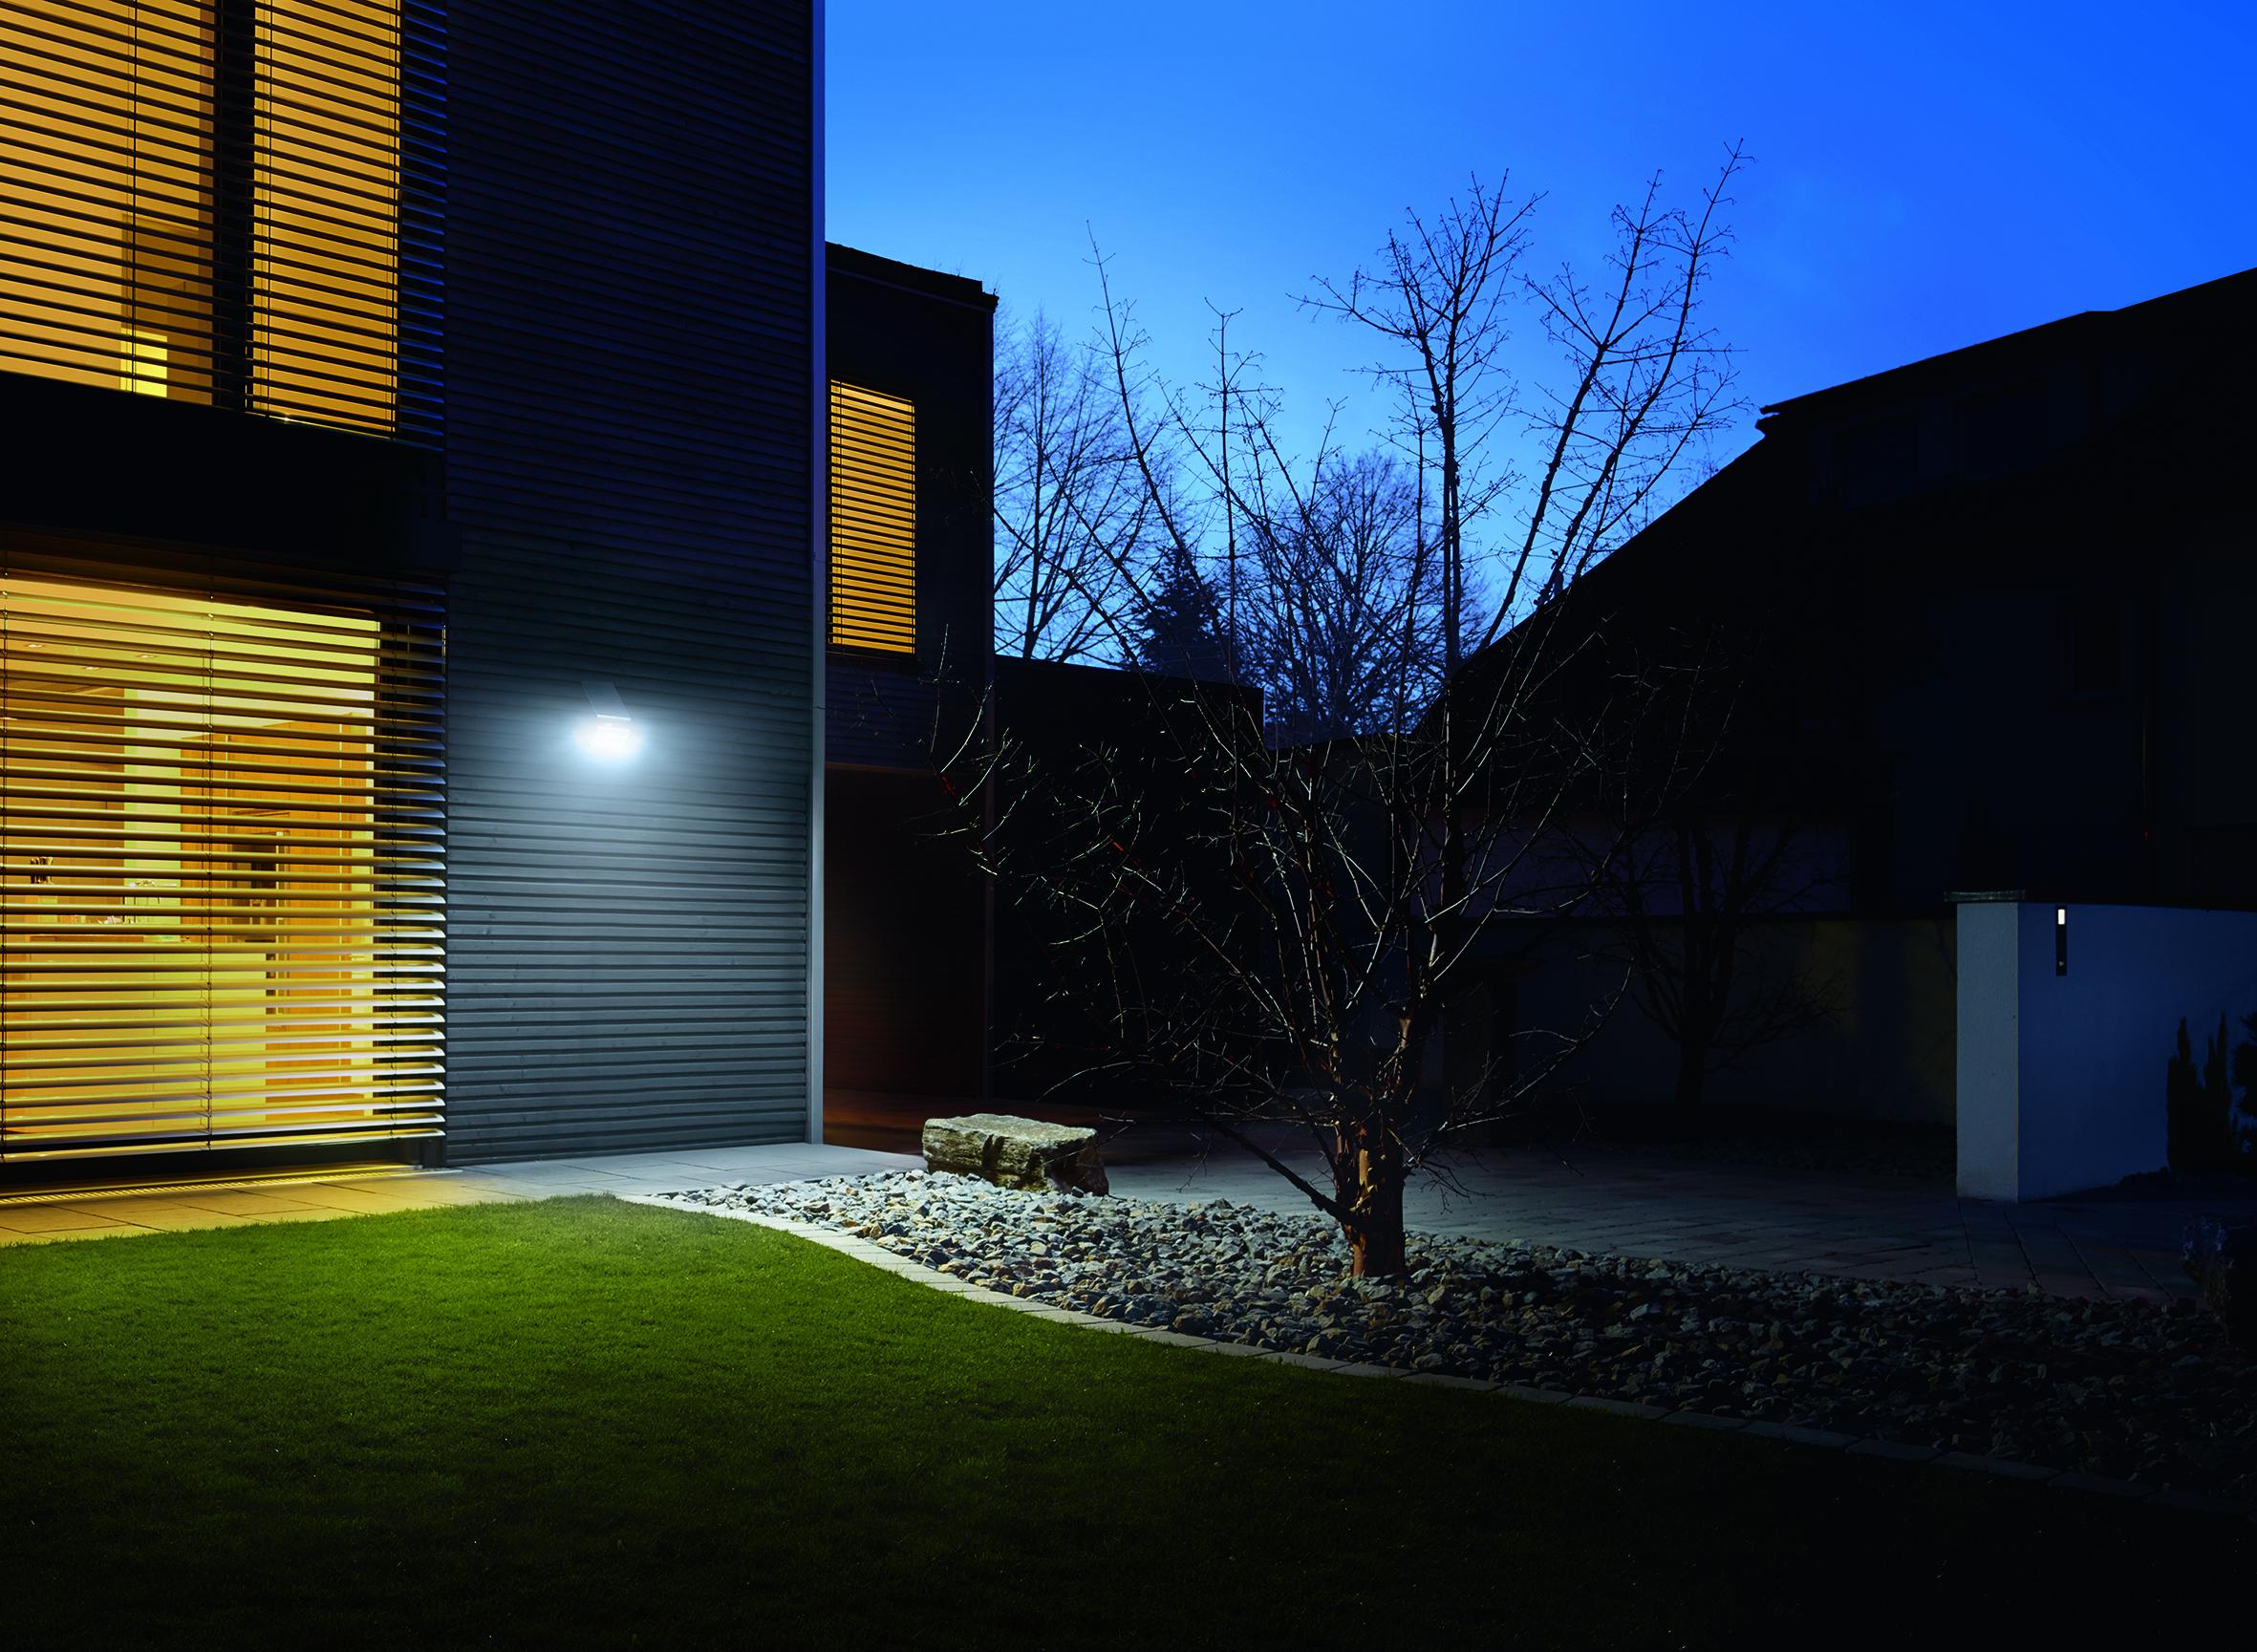 steinel wandleuchte xsolar l s wei 671006. Black Bedroom Furniture Sets. Home Design Ideas